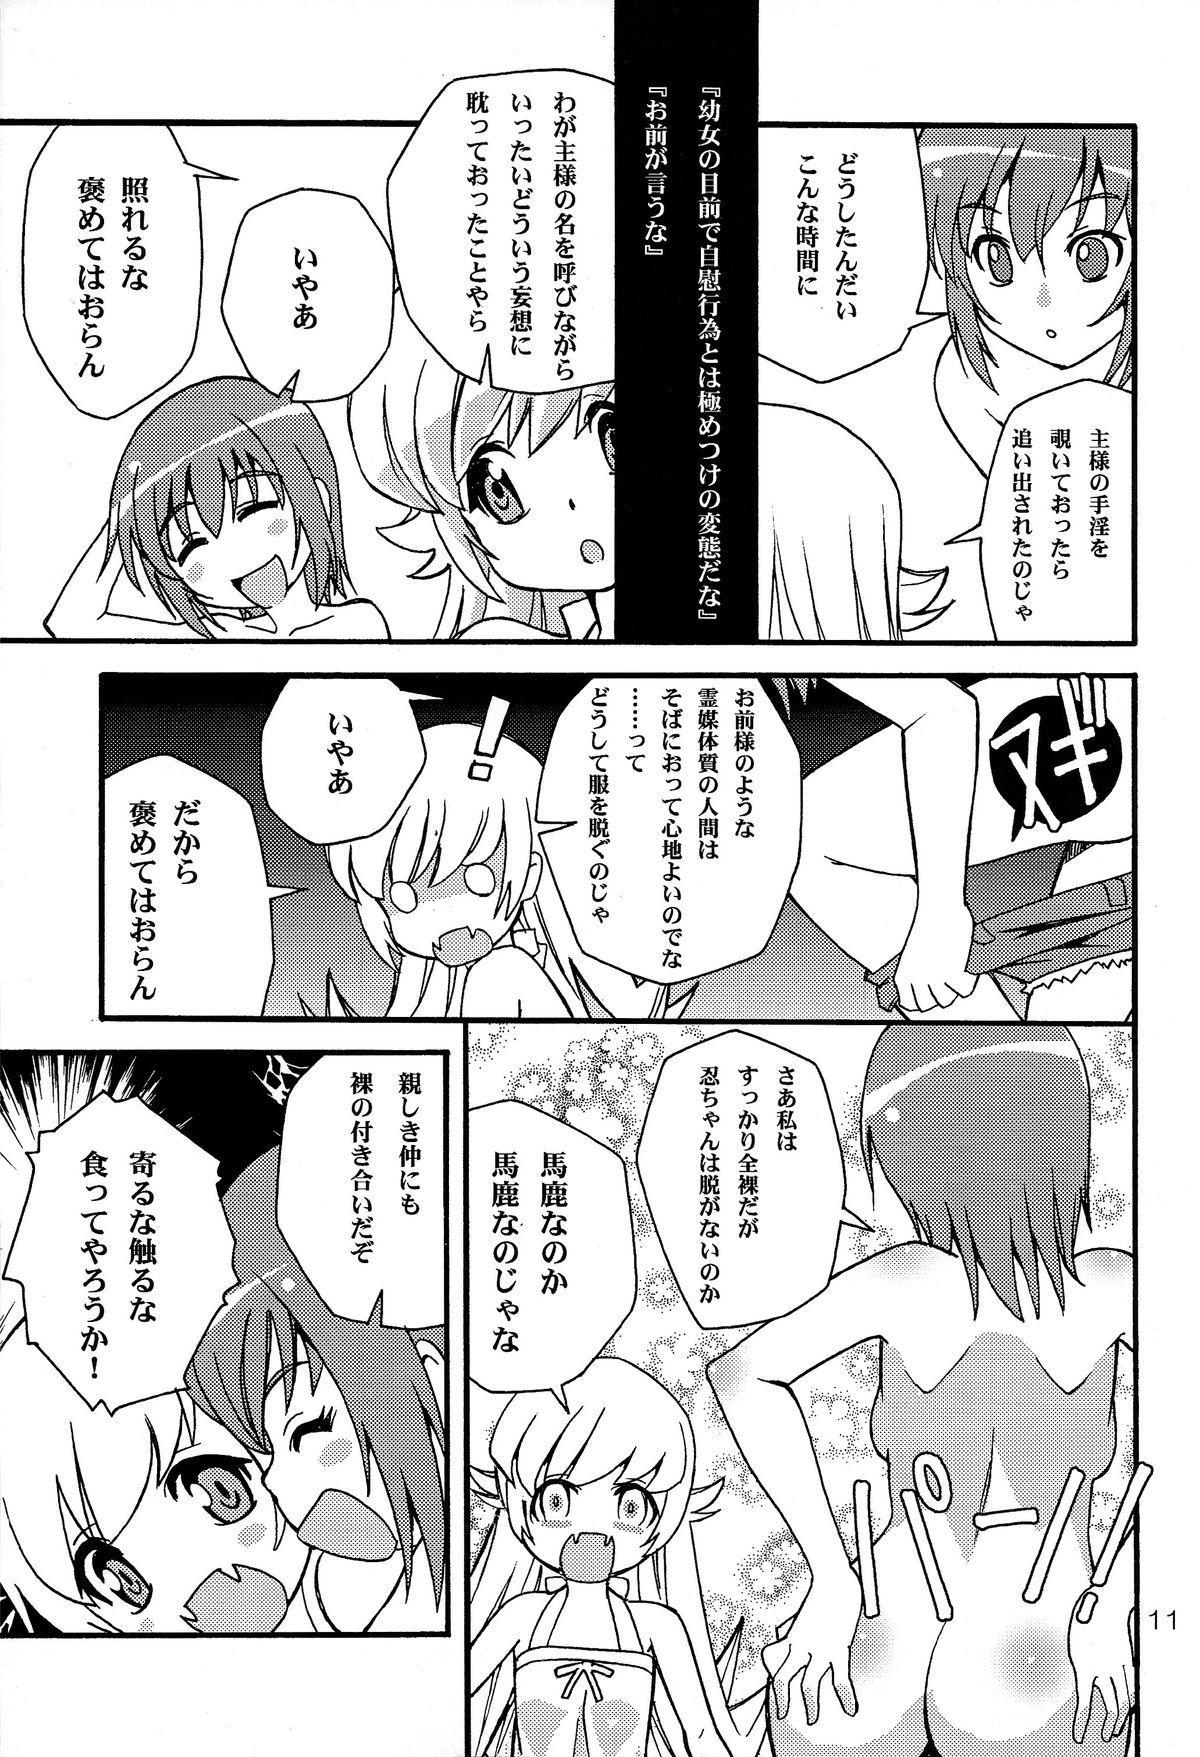 Ha no Monogatari 2014-nen Kanzenban 10